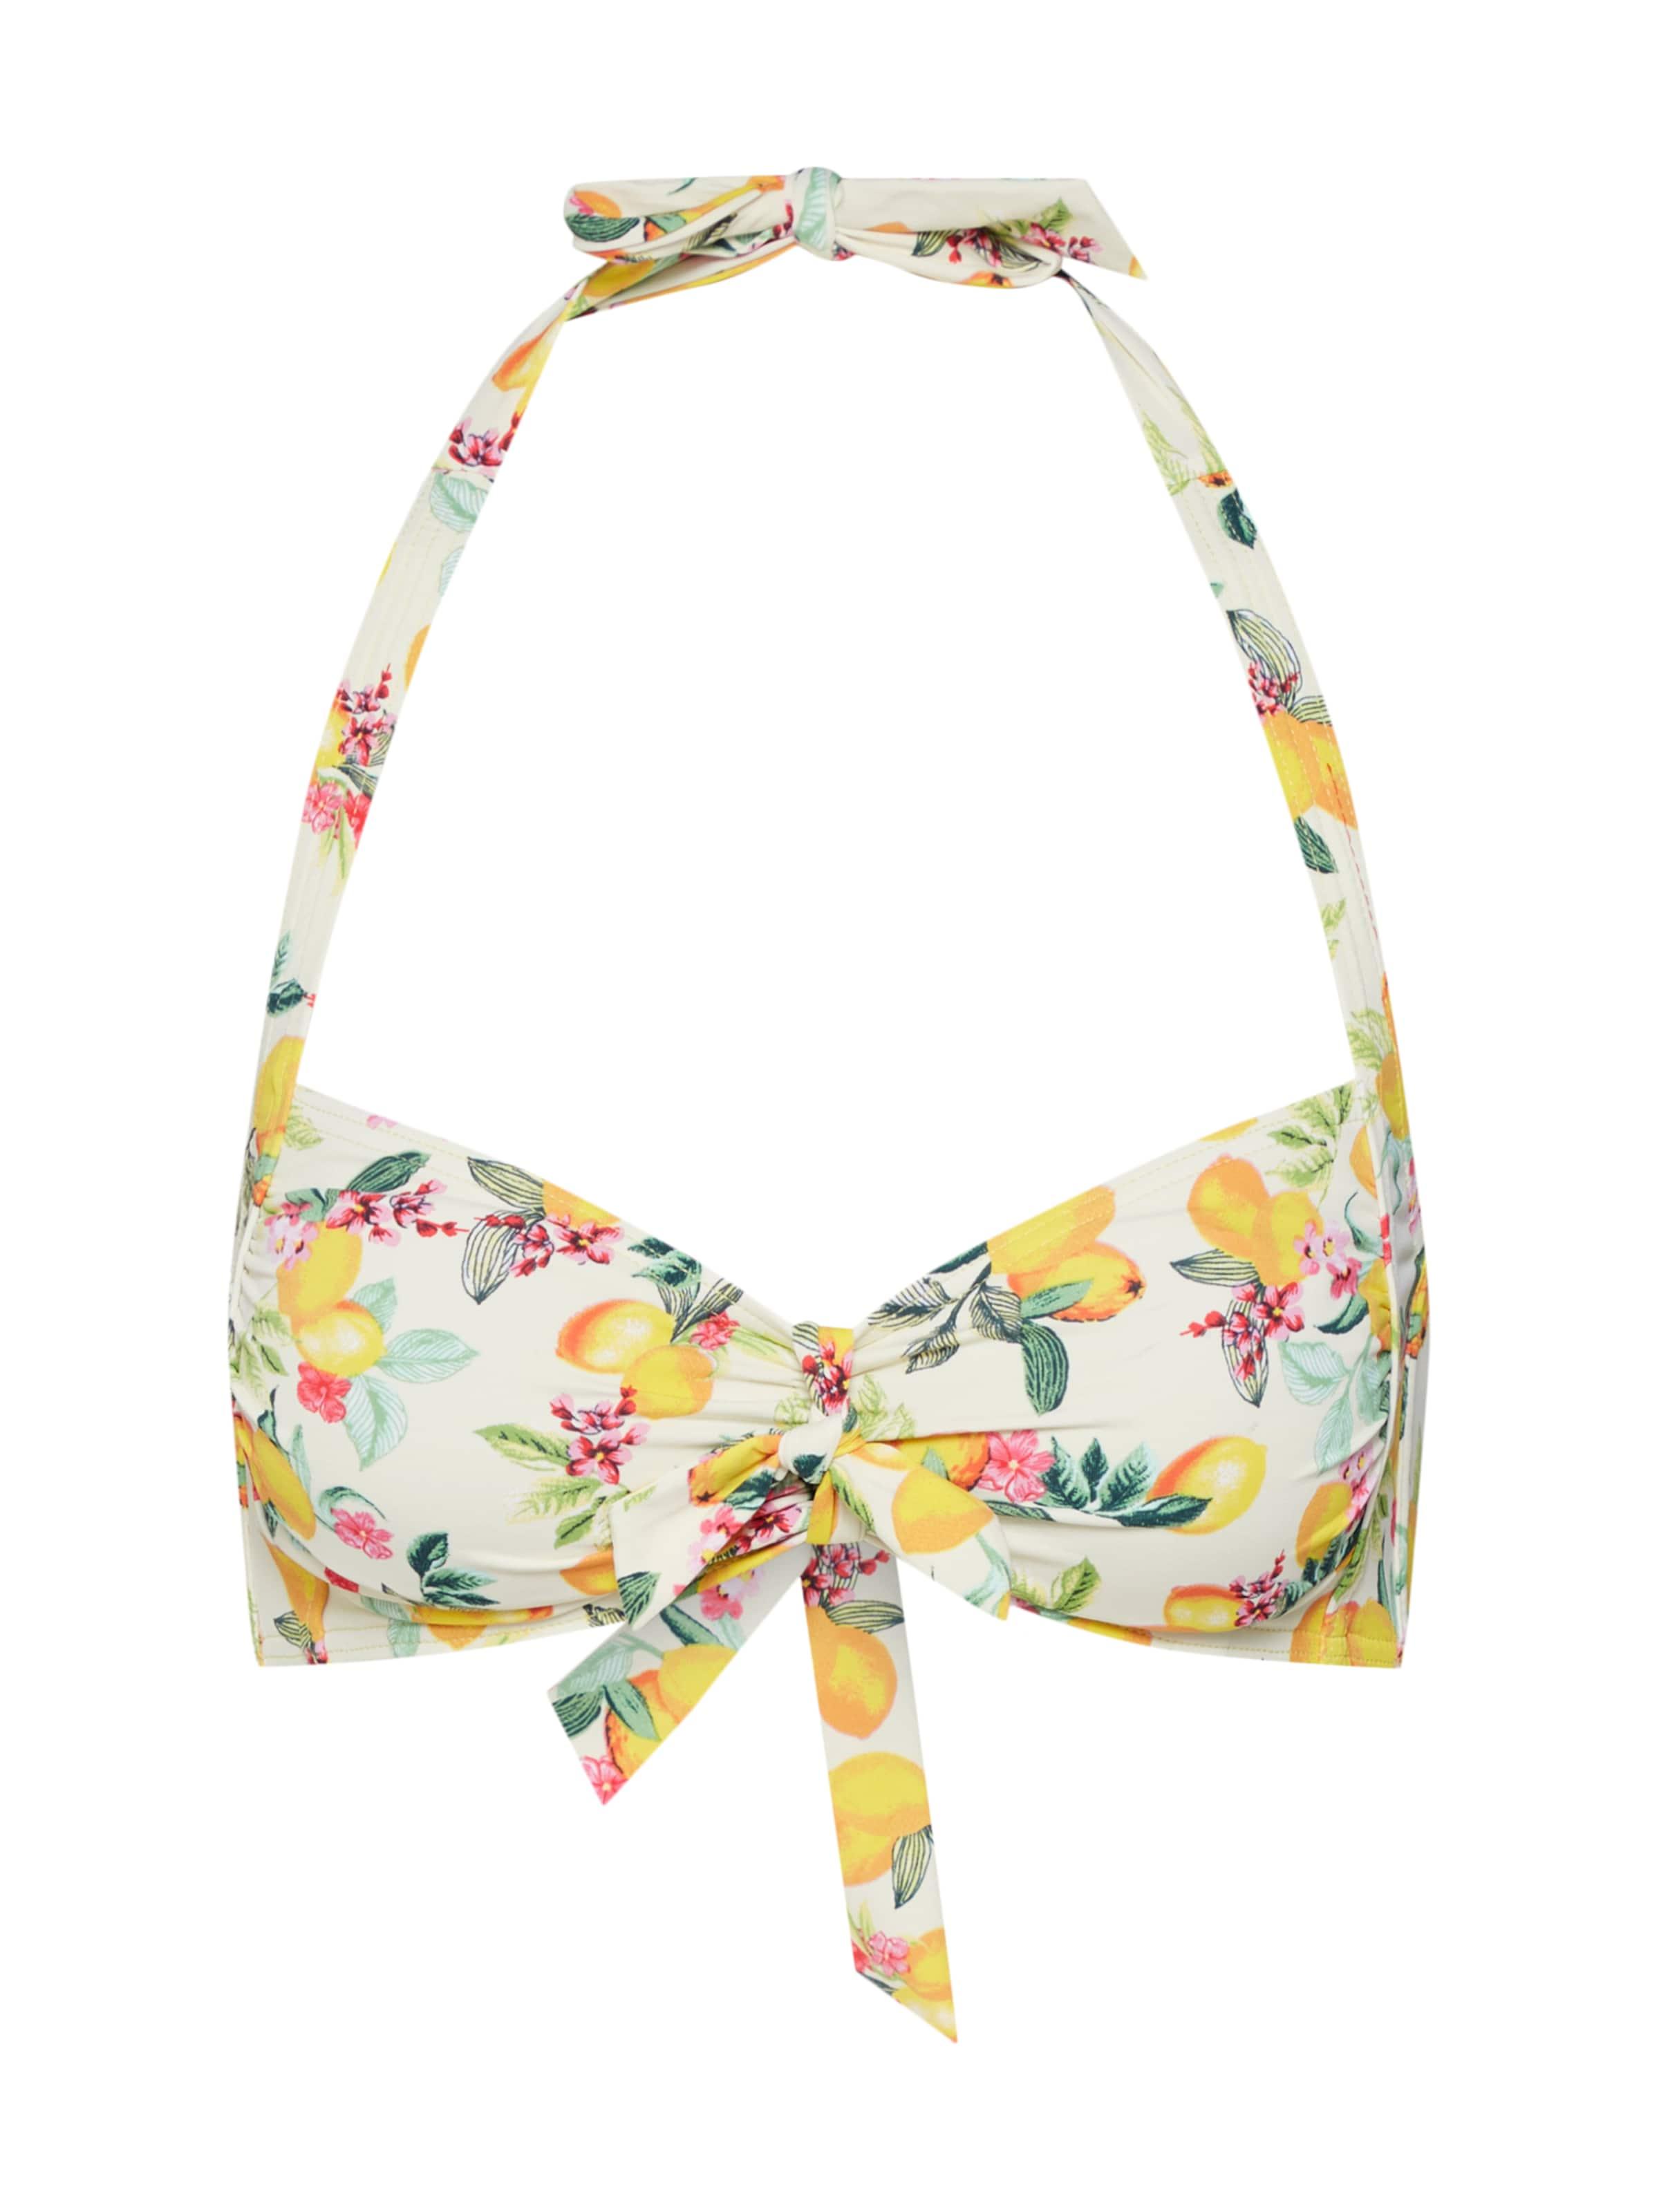 Halterneck' Esprit Pad 'panama Hauts Beach Bikini Jaune De En 08nPXNOwk